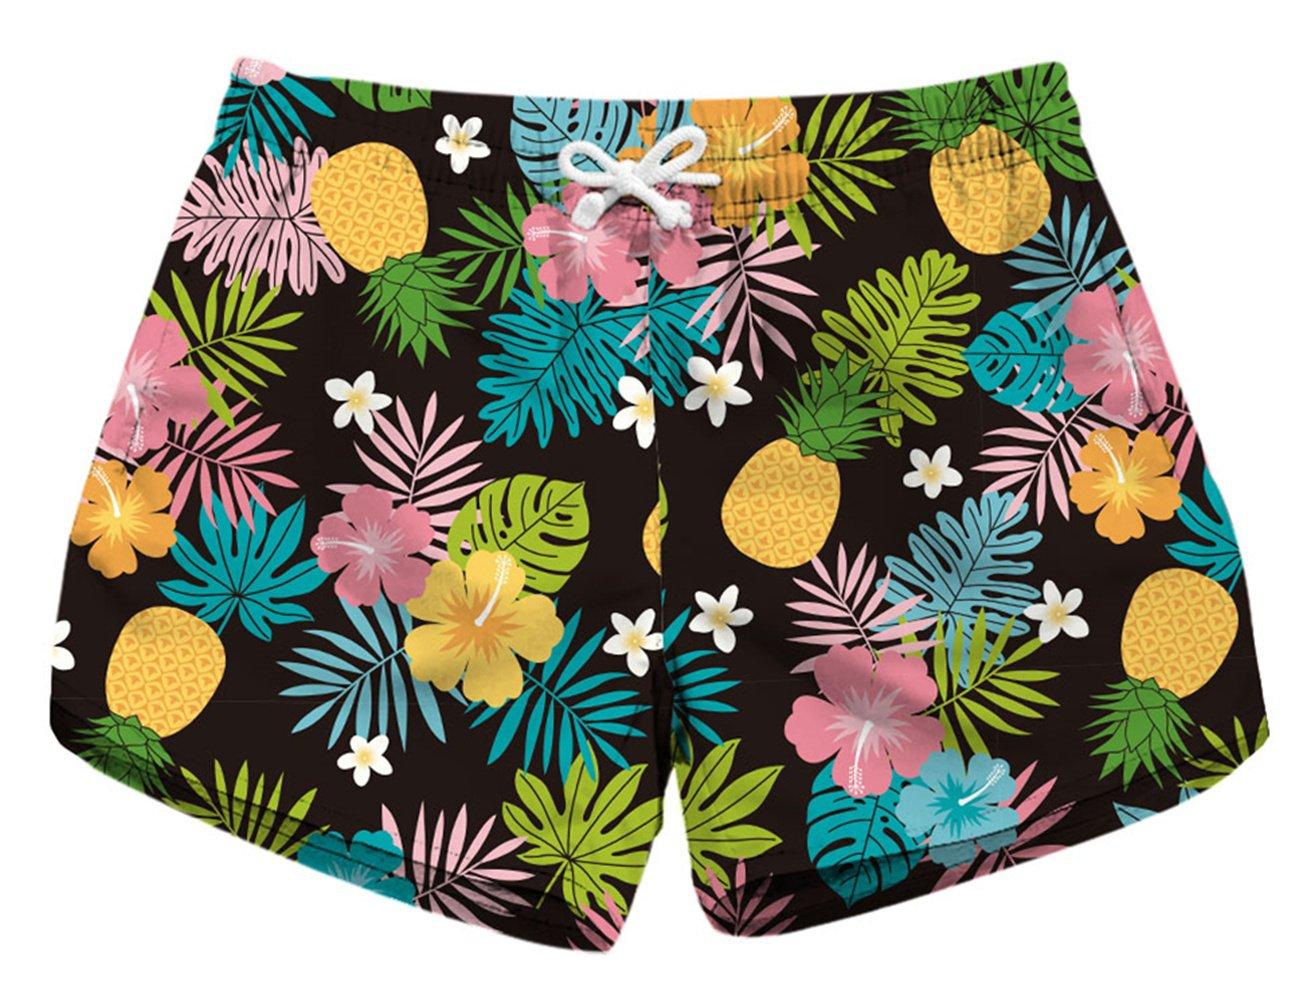 Joyhy Women's Digital Print Beach Boardshorts with Drawstring JY